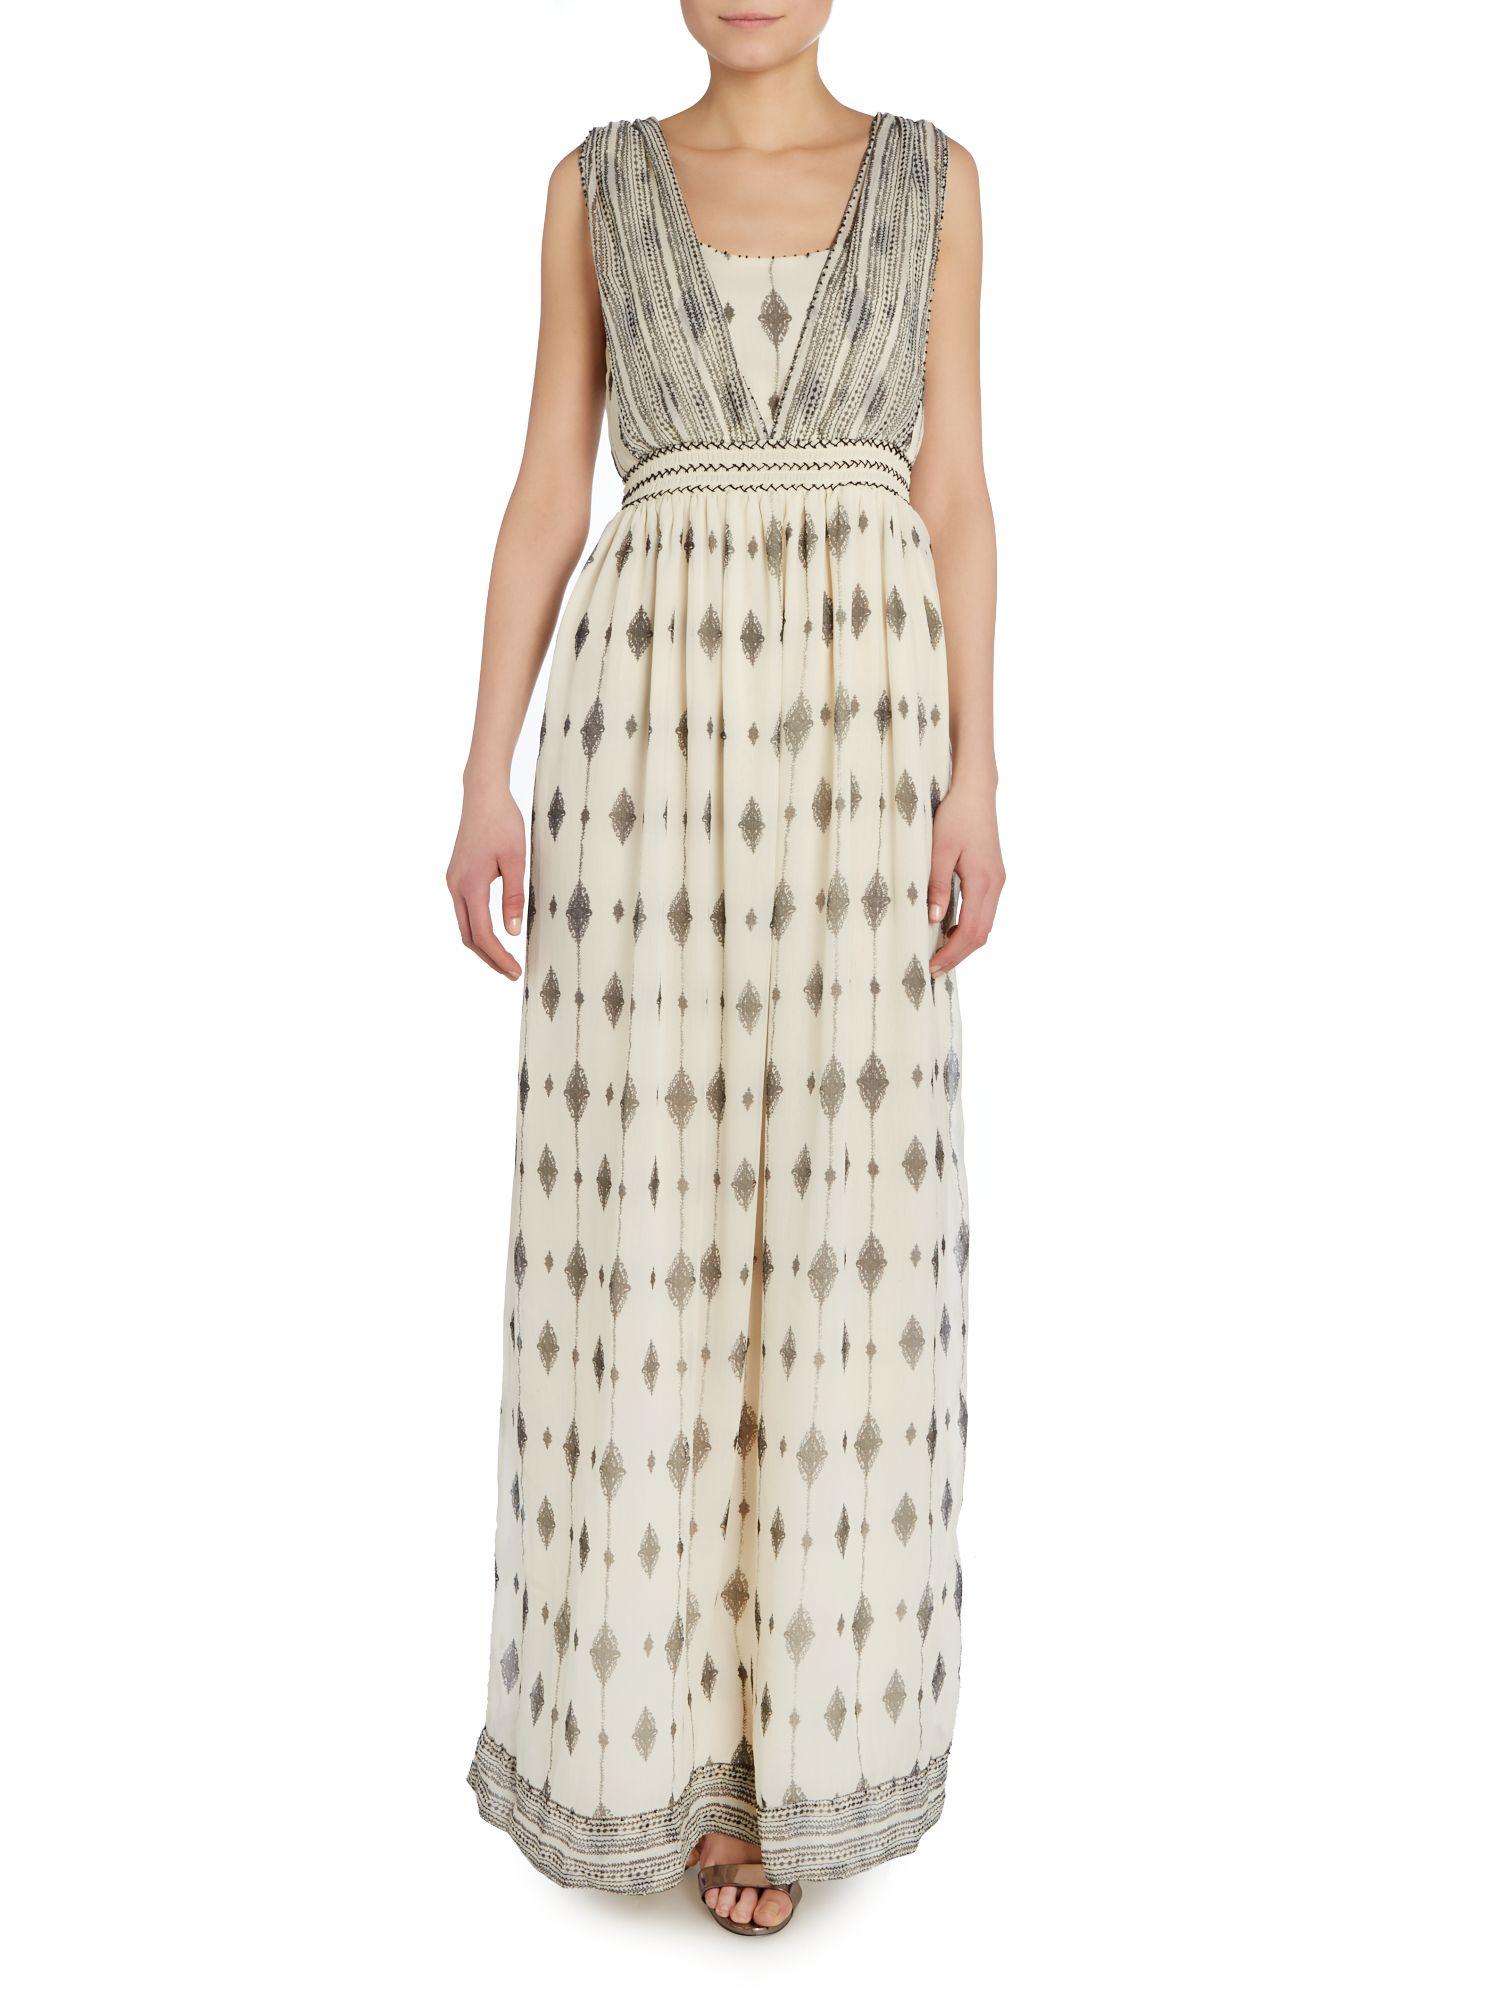 Hoss intropia guipure lace maxi dress